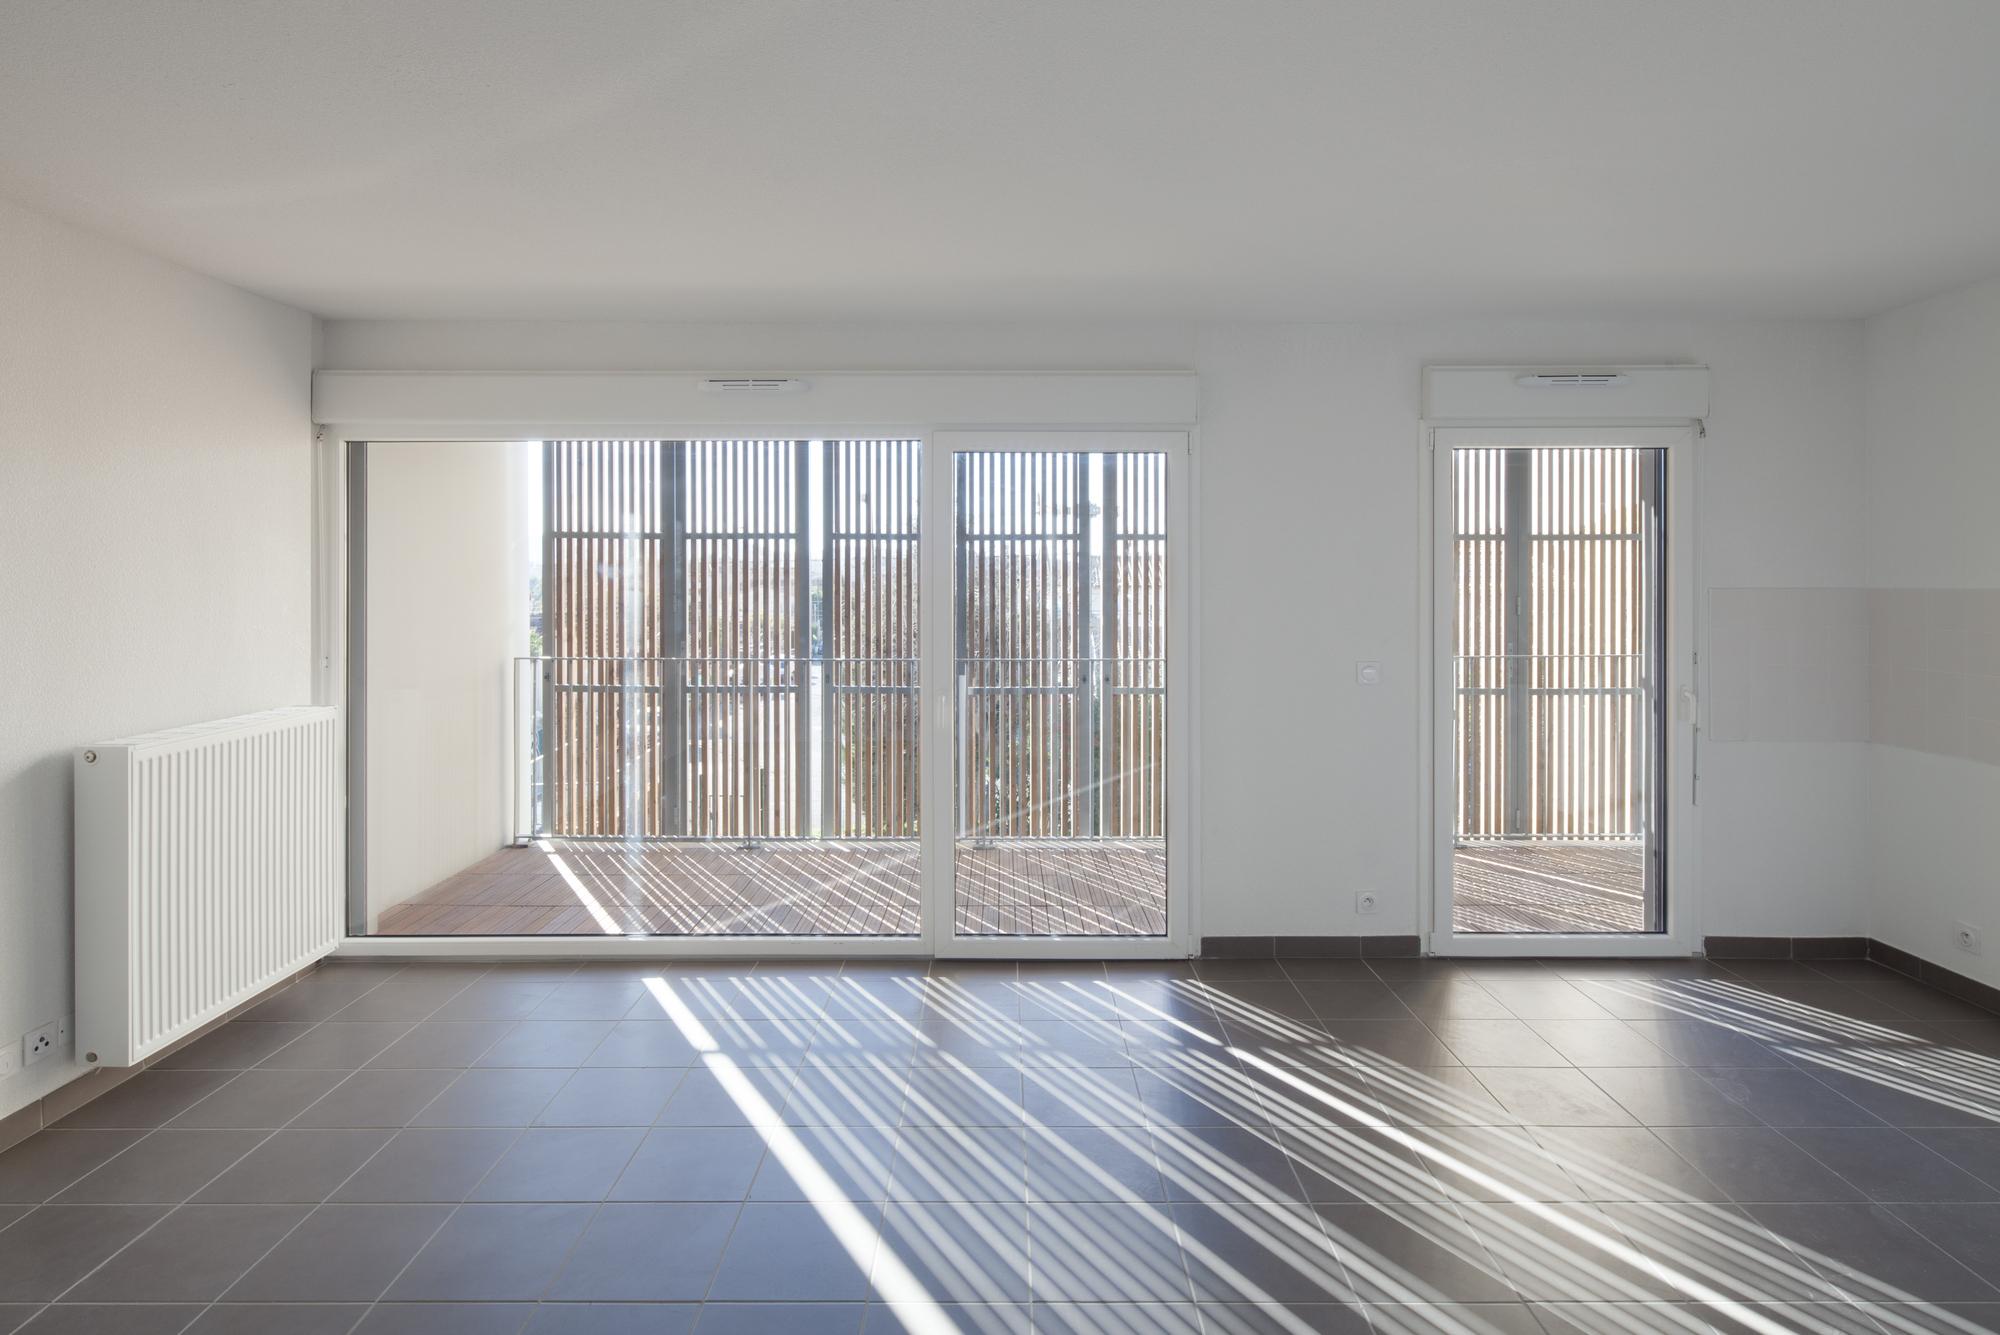 galer a de vivienda social tiendas en mouans sartoux comte et vollenweider architectes 6. Black Bedroom Furniture Sets. Home Design Ideas